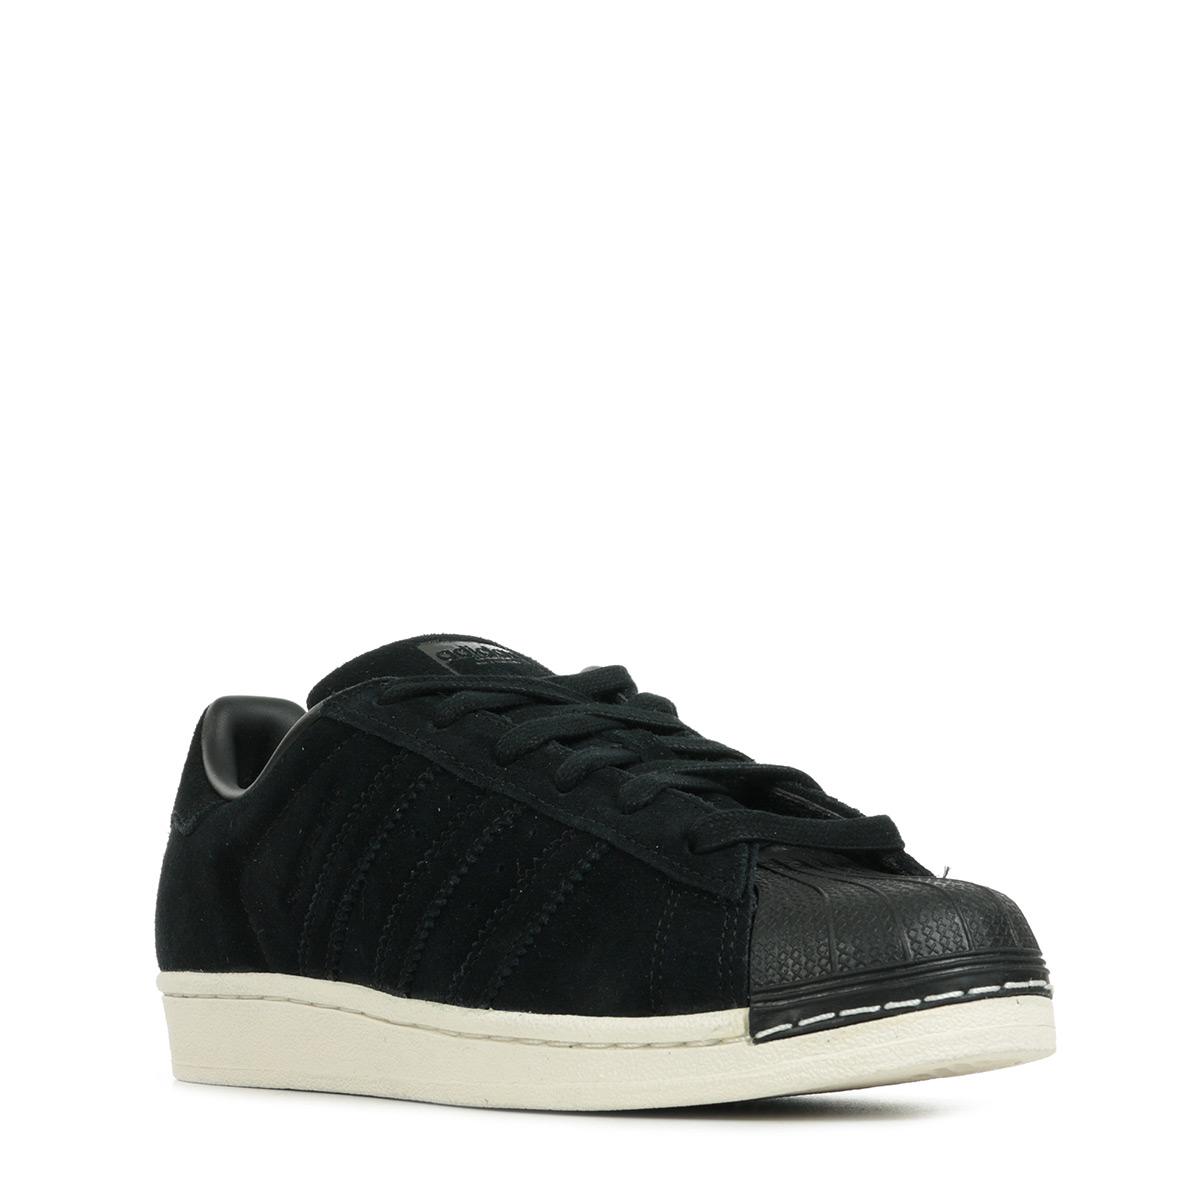 4caa05725b2 Faux En Ligne adidas Superstar Core Black BZ0201 Baskets mode ...